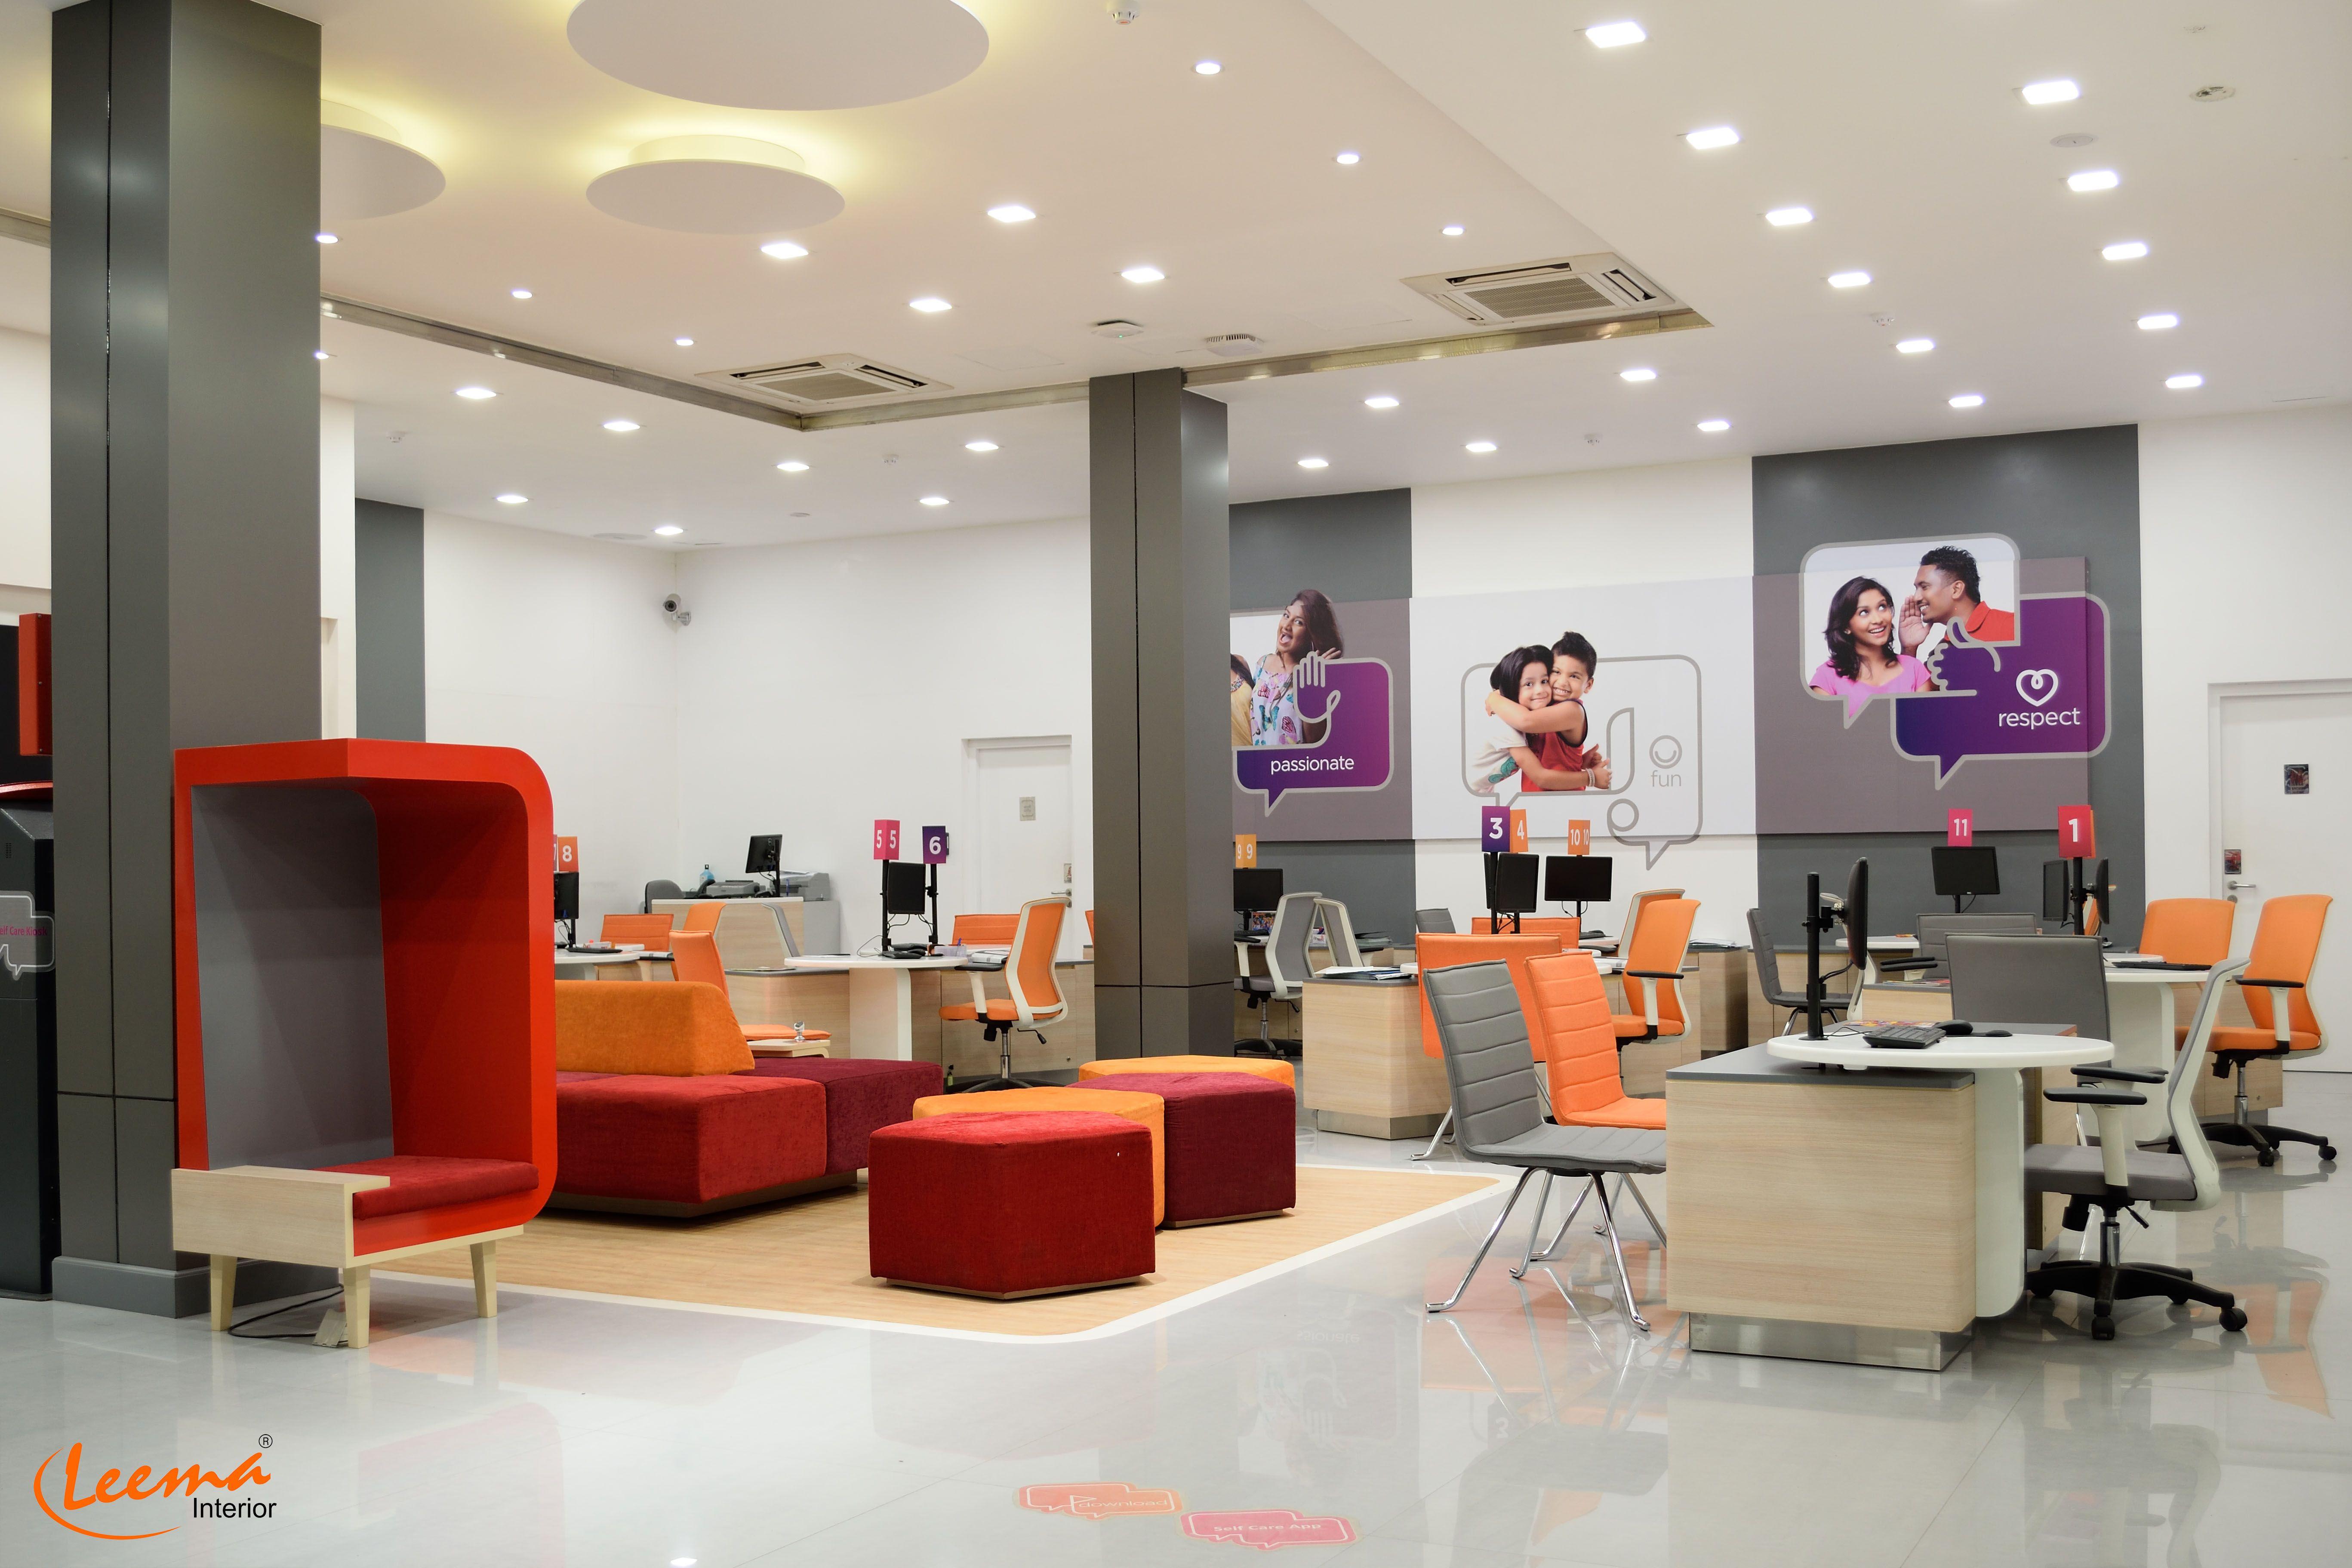 Dialog sri lanka head office interior decoration for Interior designs in sri lanka